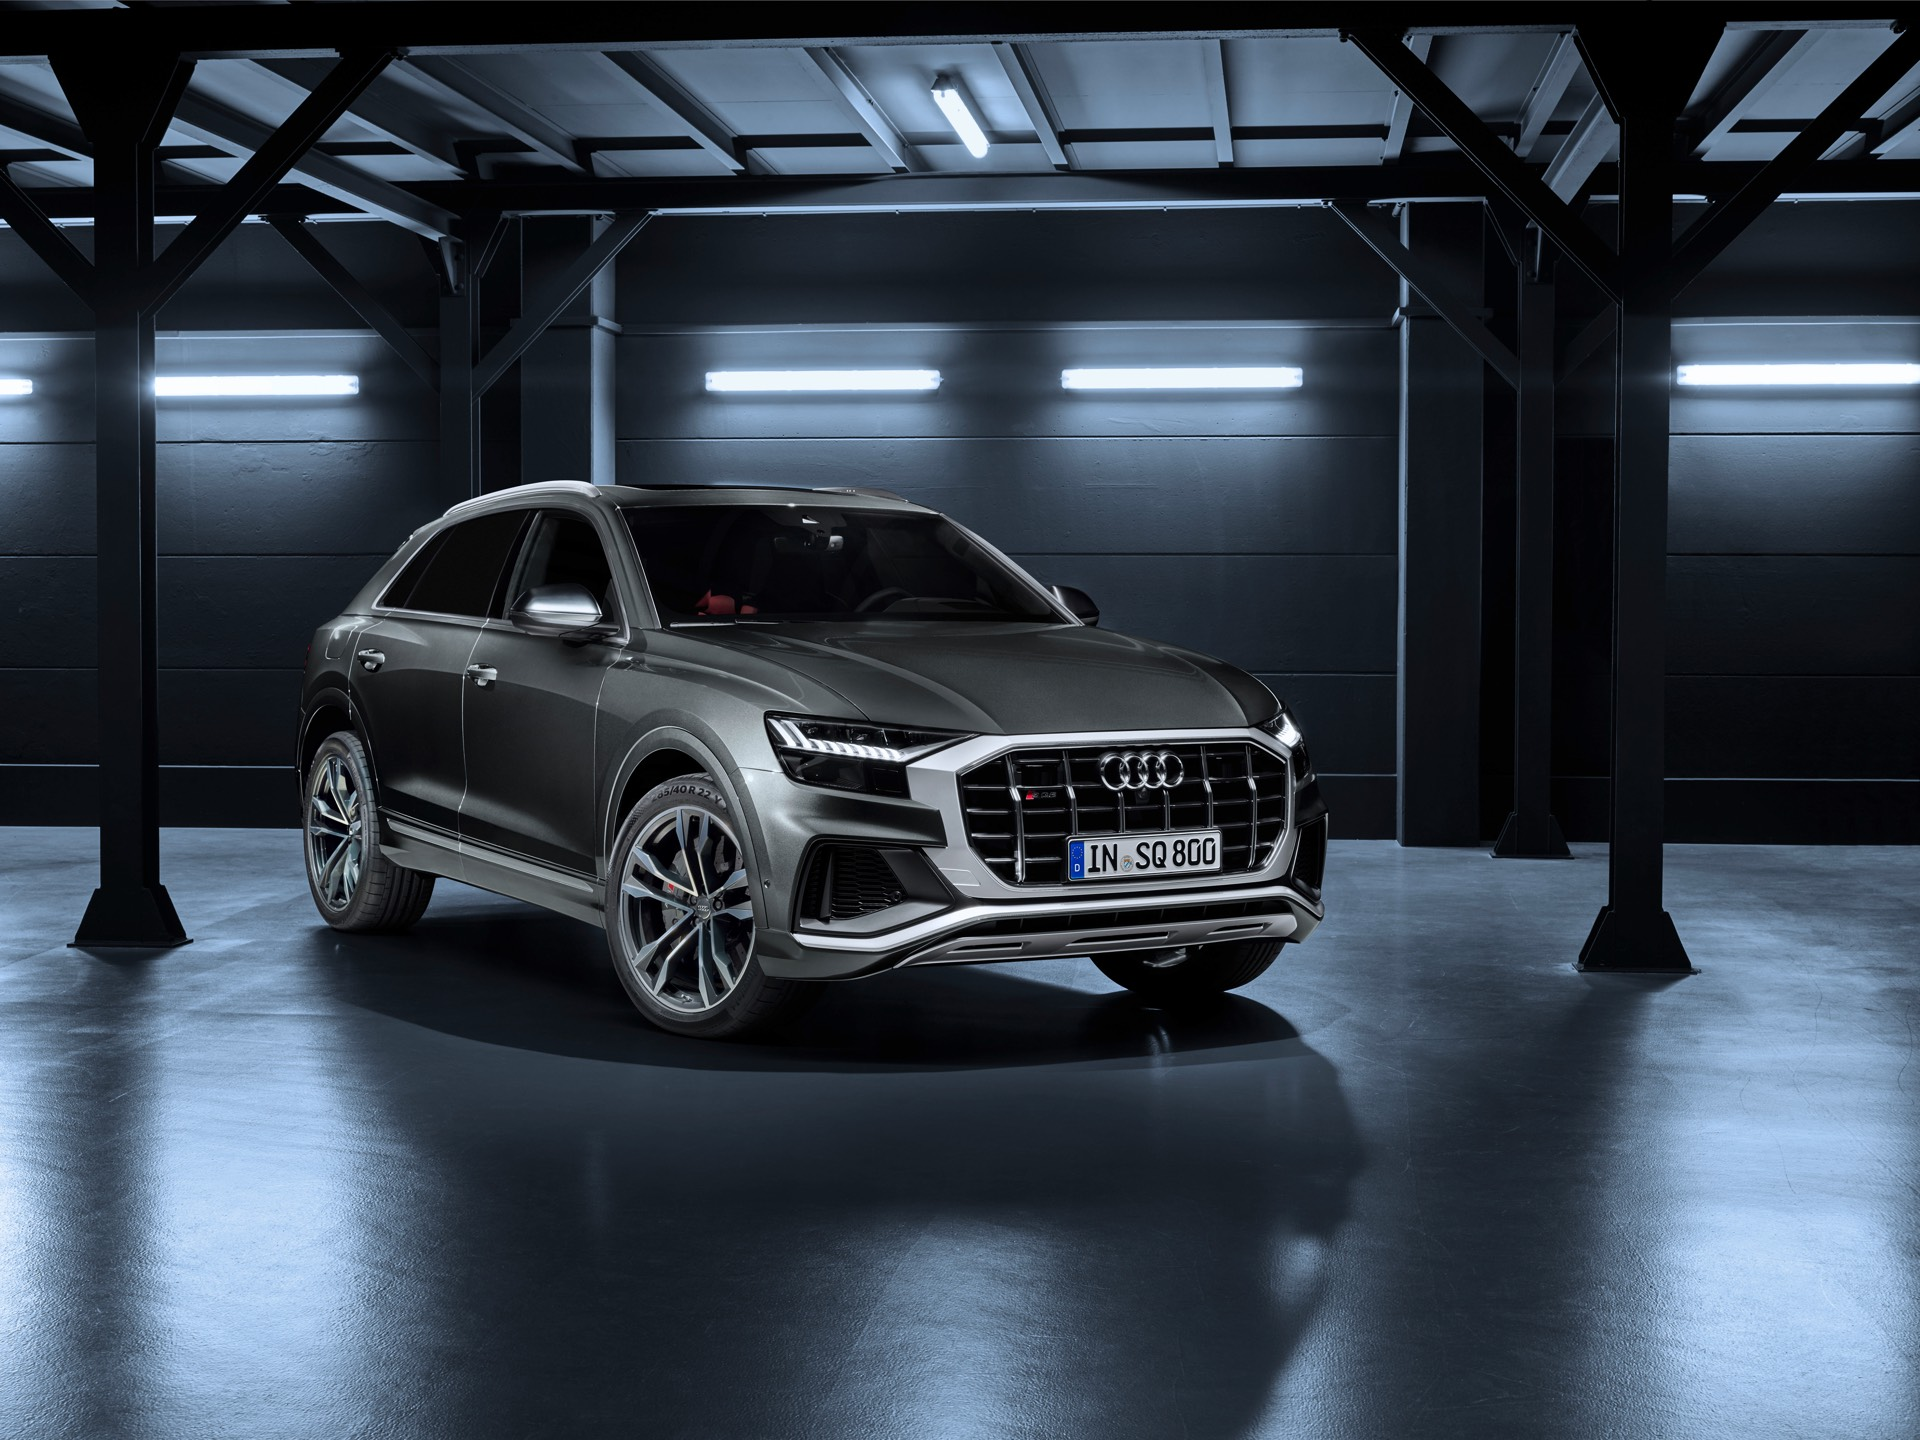 Audi SQ8 TDI Front Quarter